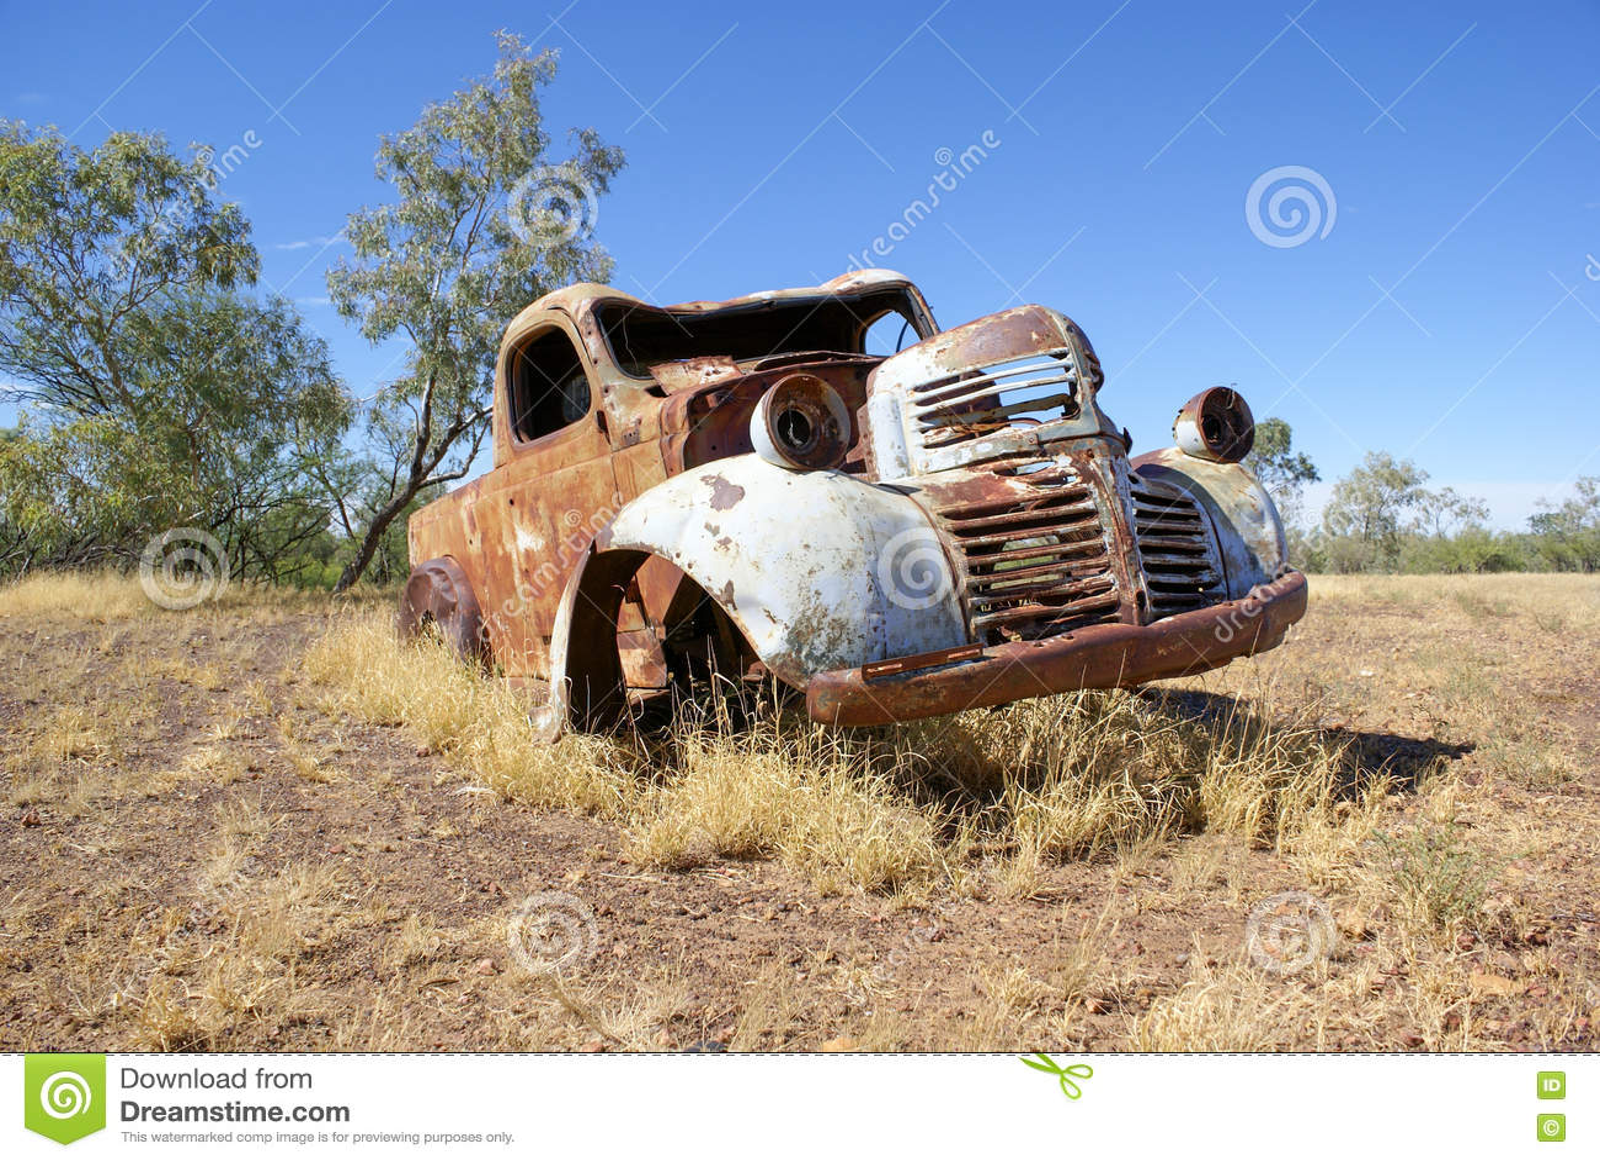 Abandoned Car Australia Stock Photos - Royalty Free Images